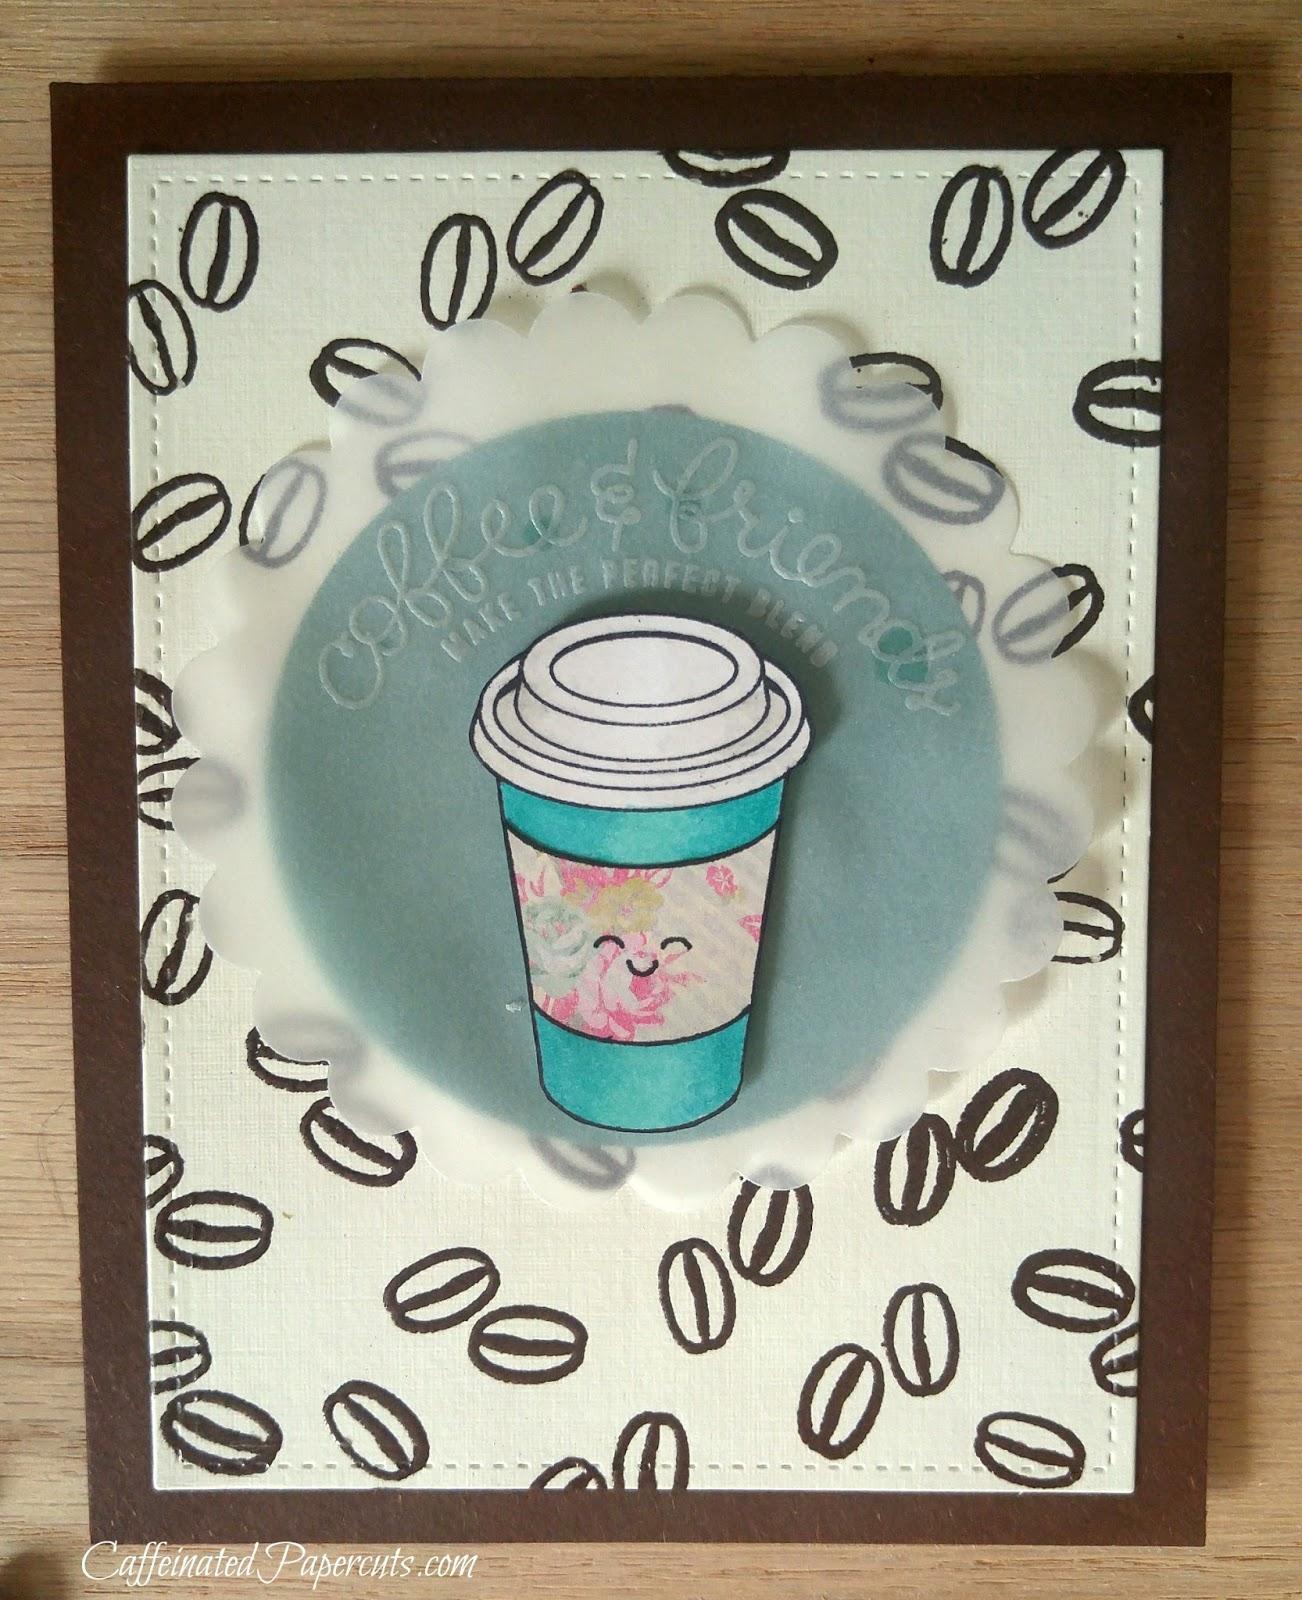 Caffeinated Papercuts